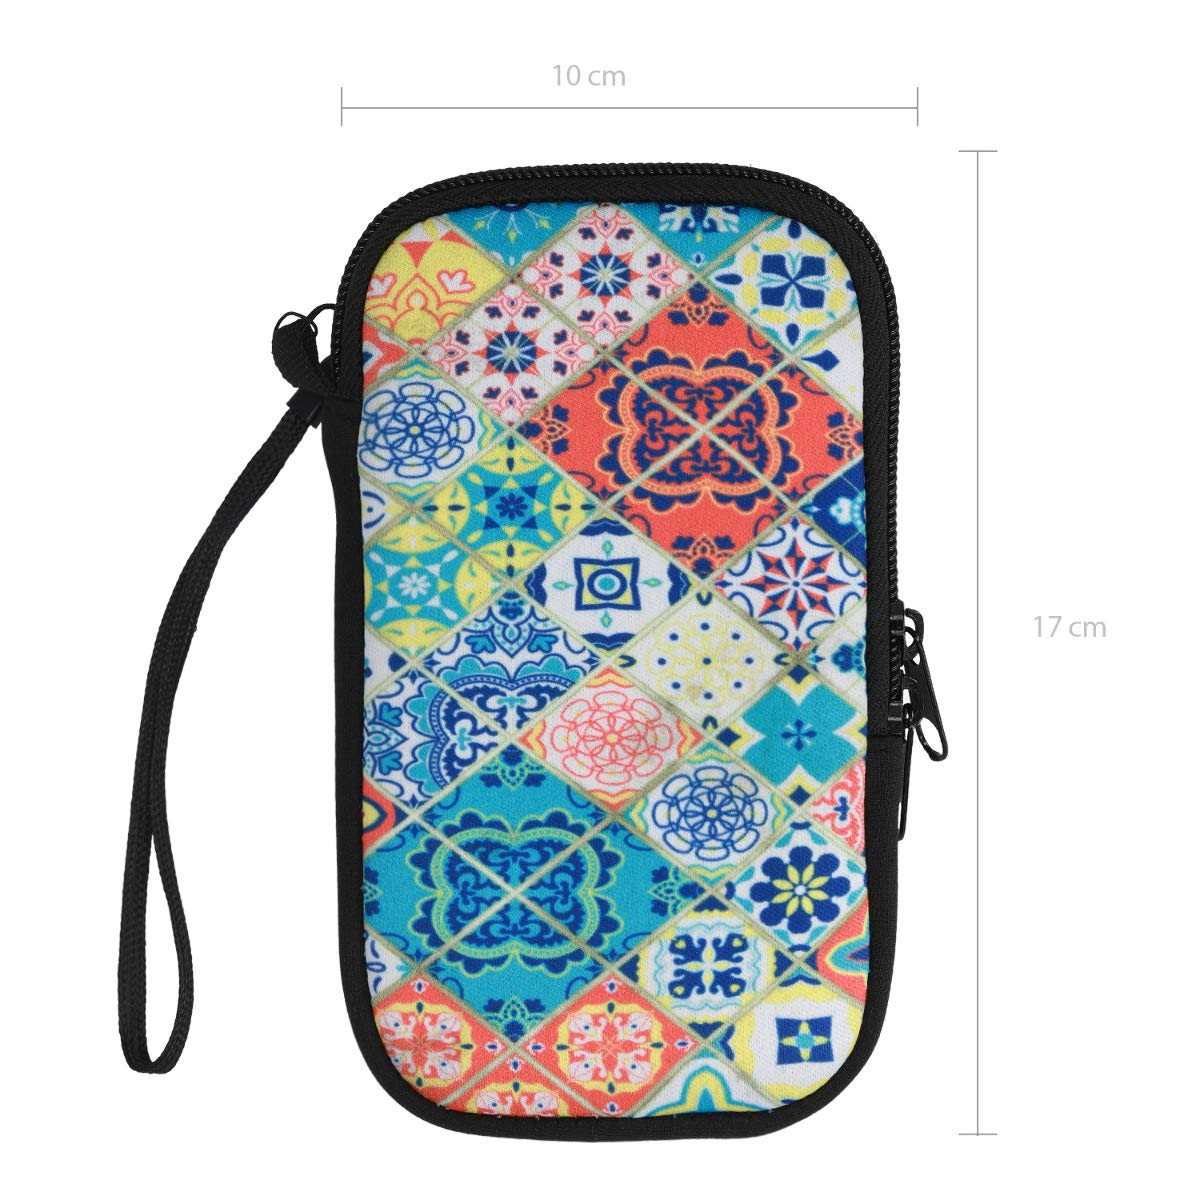 6,5 Dont Touch My Phone Design Wei/ß Dunkelgrau kwmobile Handytasche f/ür Smartphones L Handy Filztasche 16,2 x 8,3 cm Innenma/ße